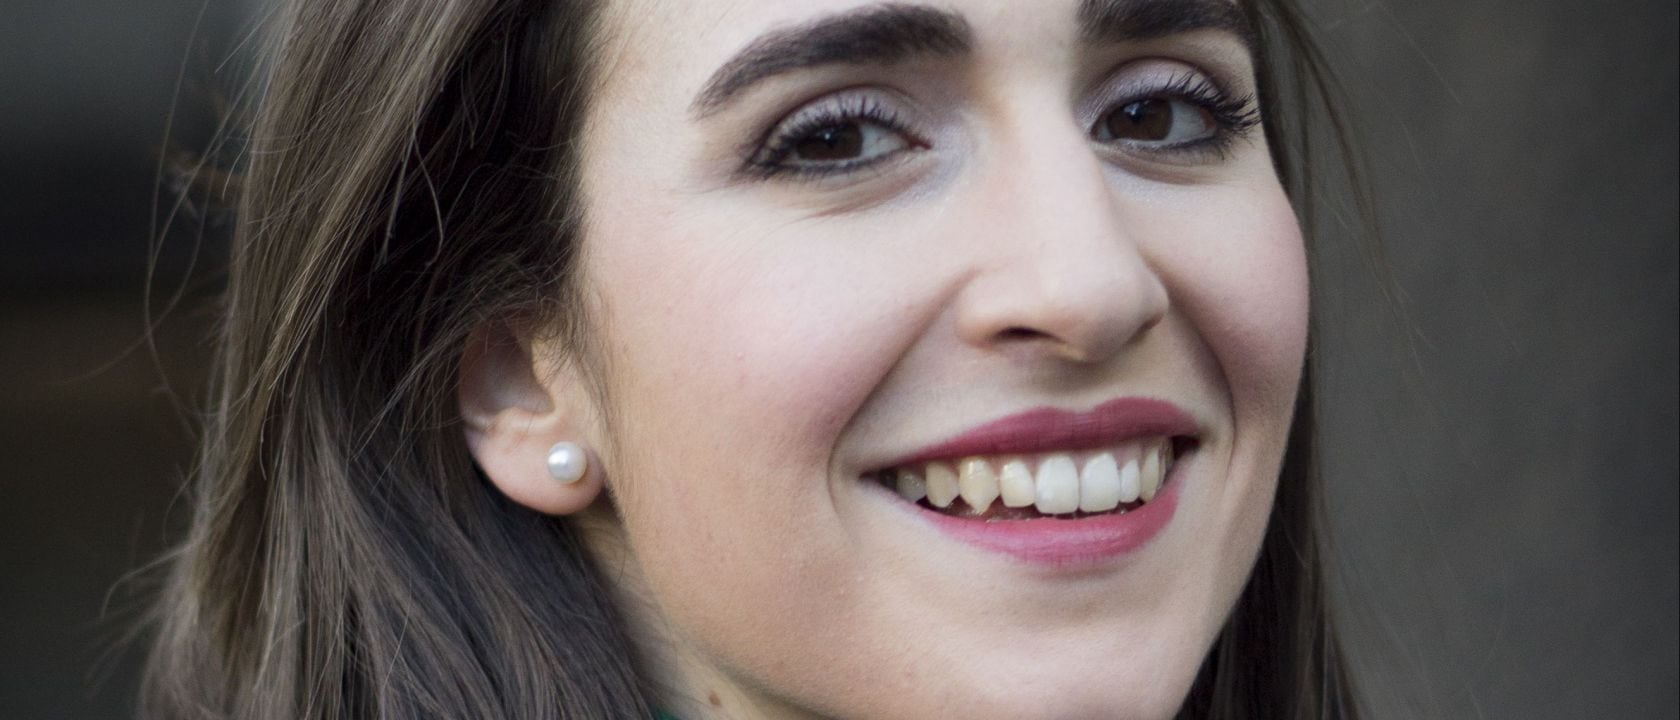 Carmen Artaza Sängerin Mezzosopran Teilnehmer Young Singers Project